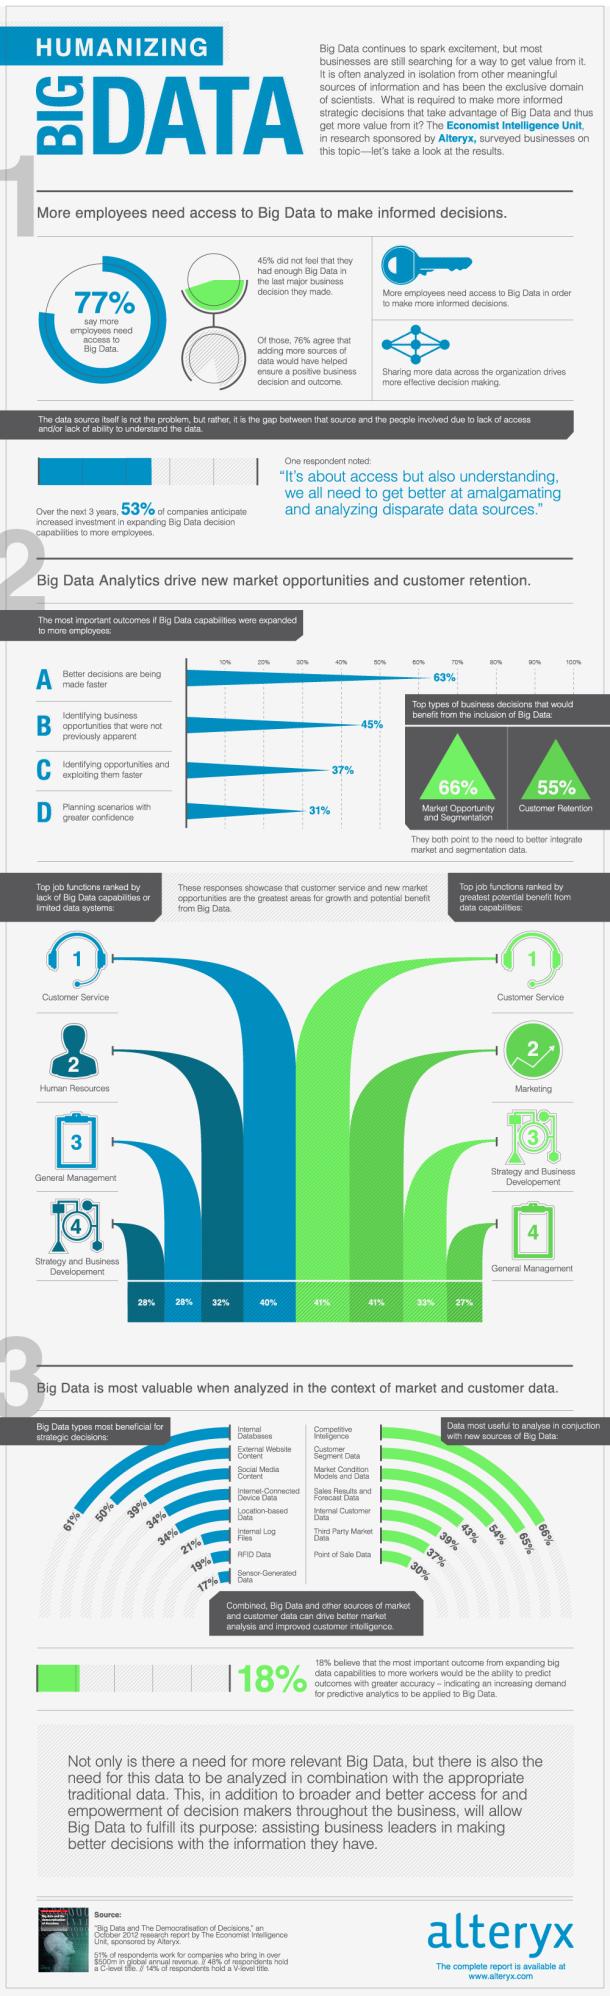 Humanizing Big Data[INFOGRAPHIC]